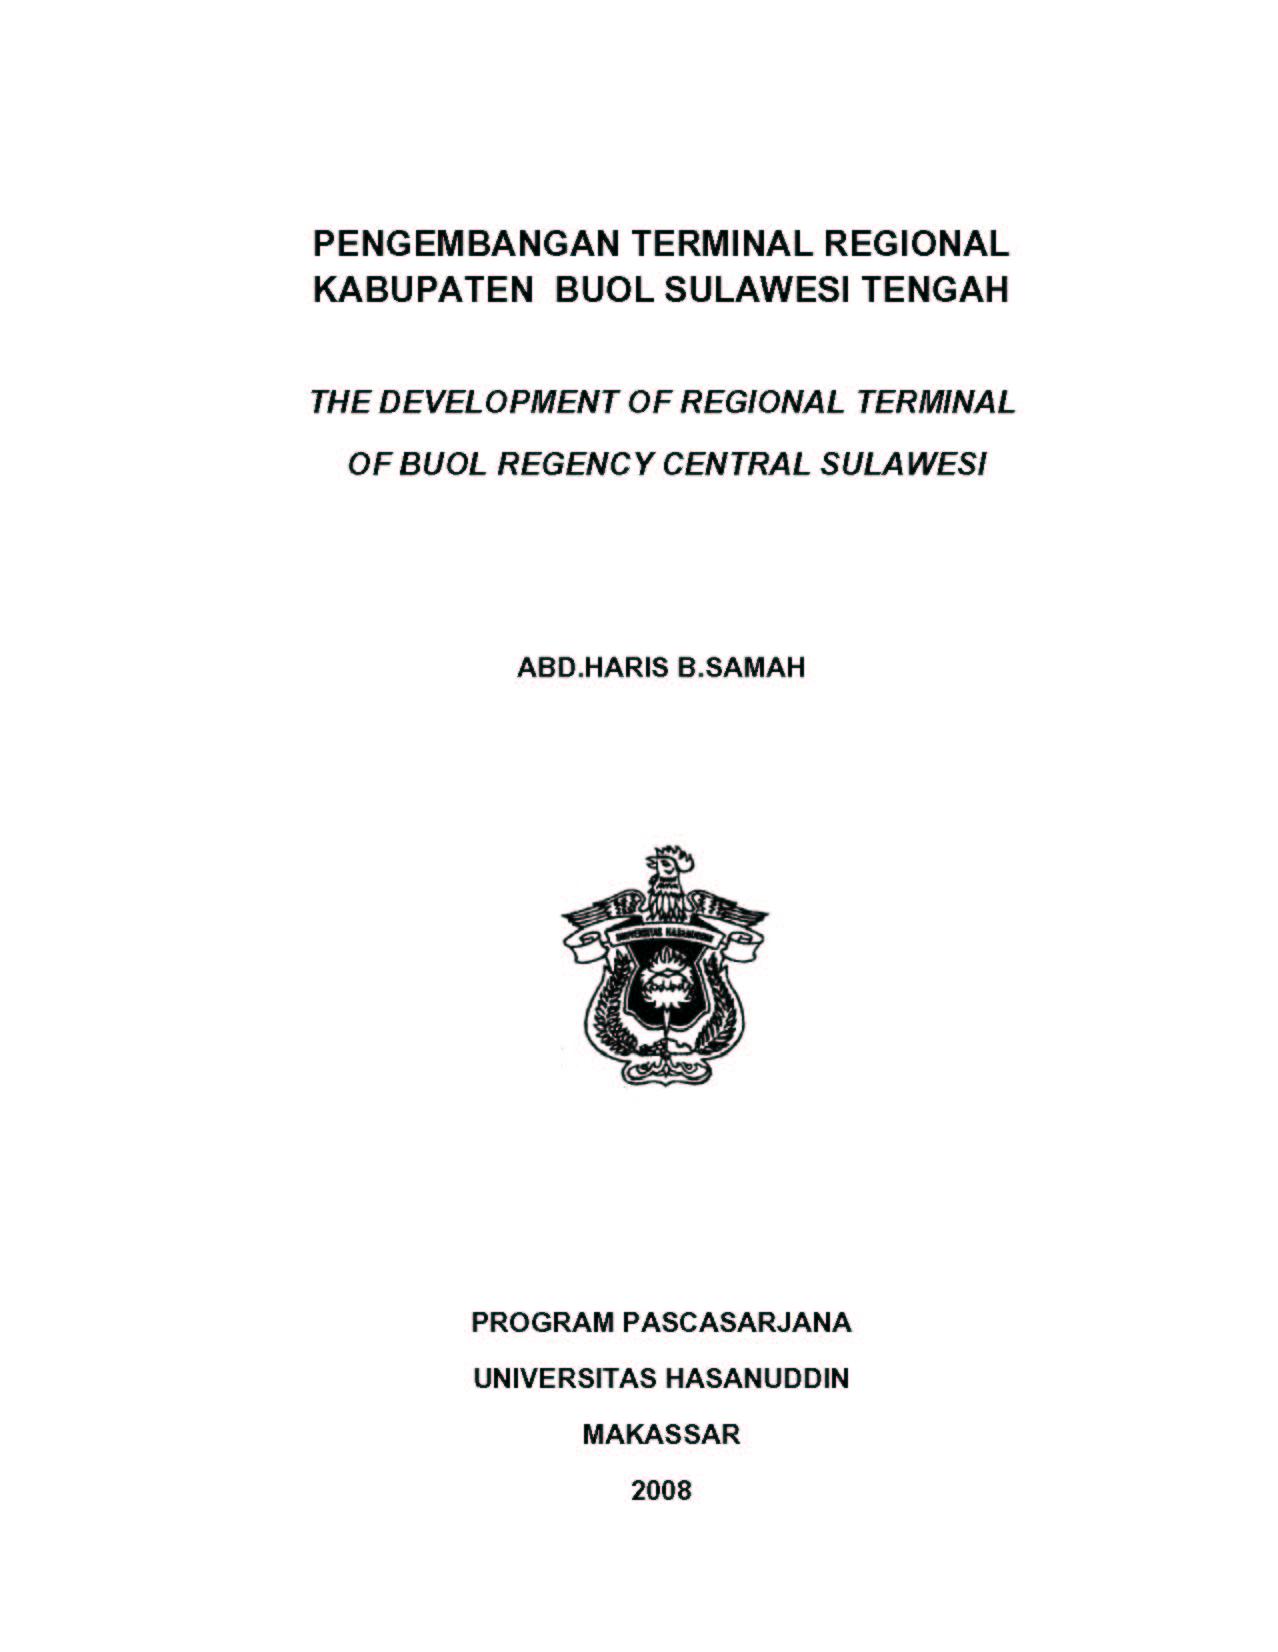 Pengembangan Terminal Regional Kabupaten Buol Sulawesi Tengah The Development Of Regional Terminal Of Buol Regency Central Sulawesi Abd Haris B Samah Perpustakaan Universitas Hasanuddin